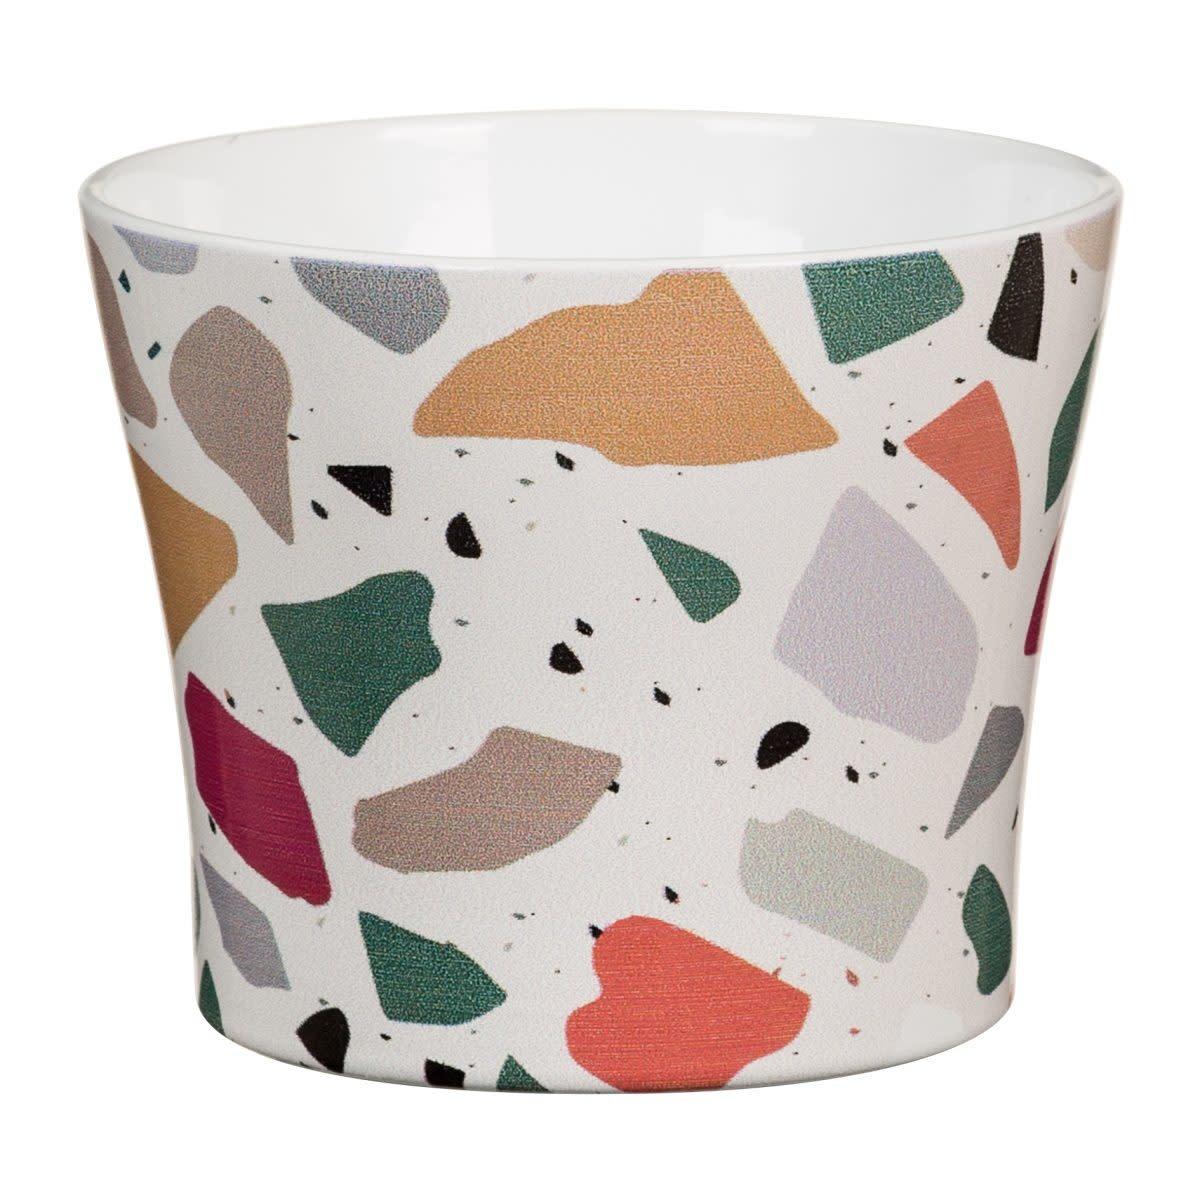 Terrazzo pot-1